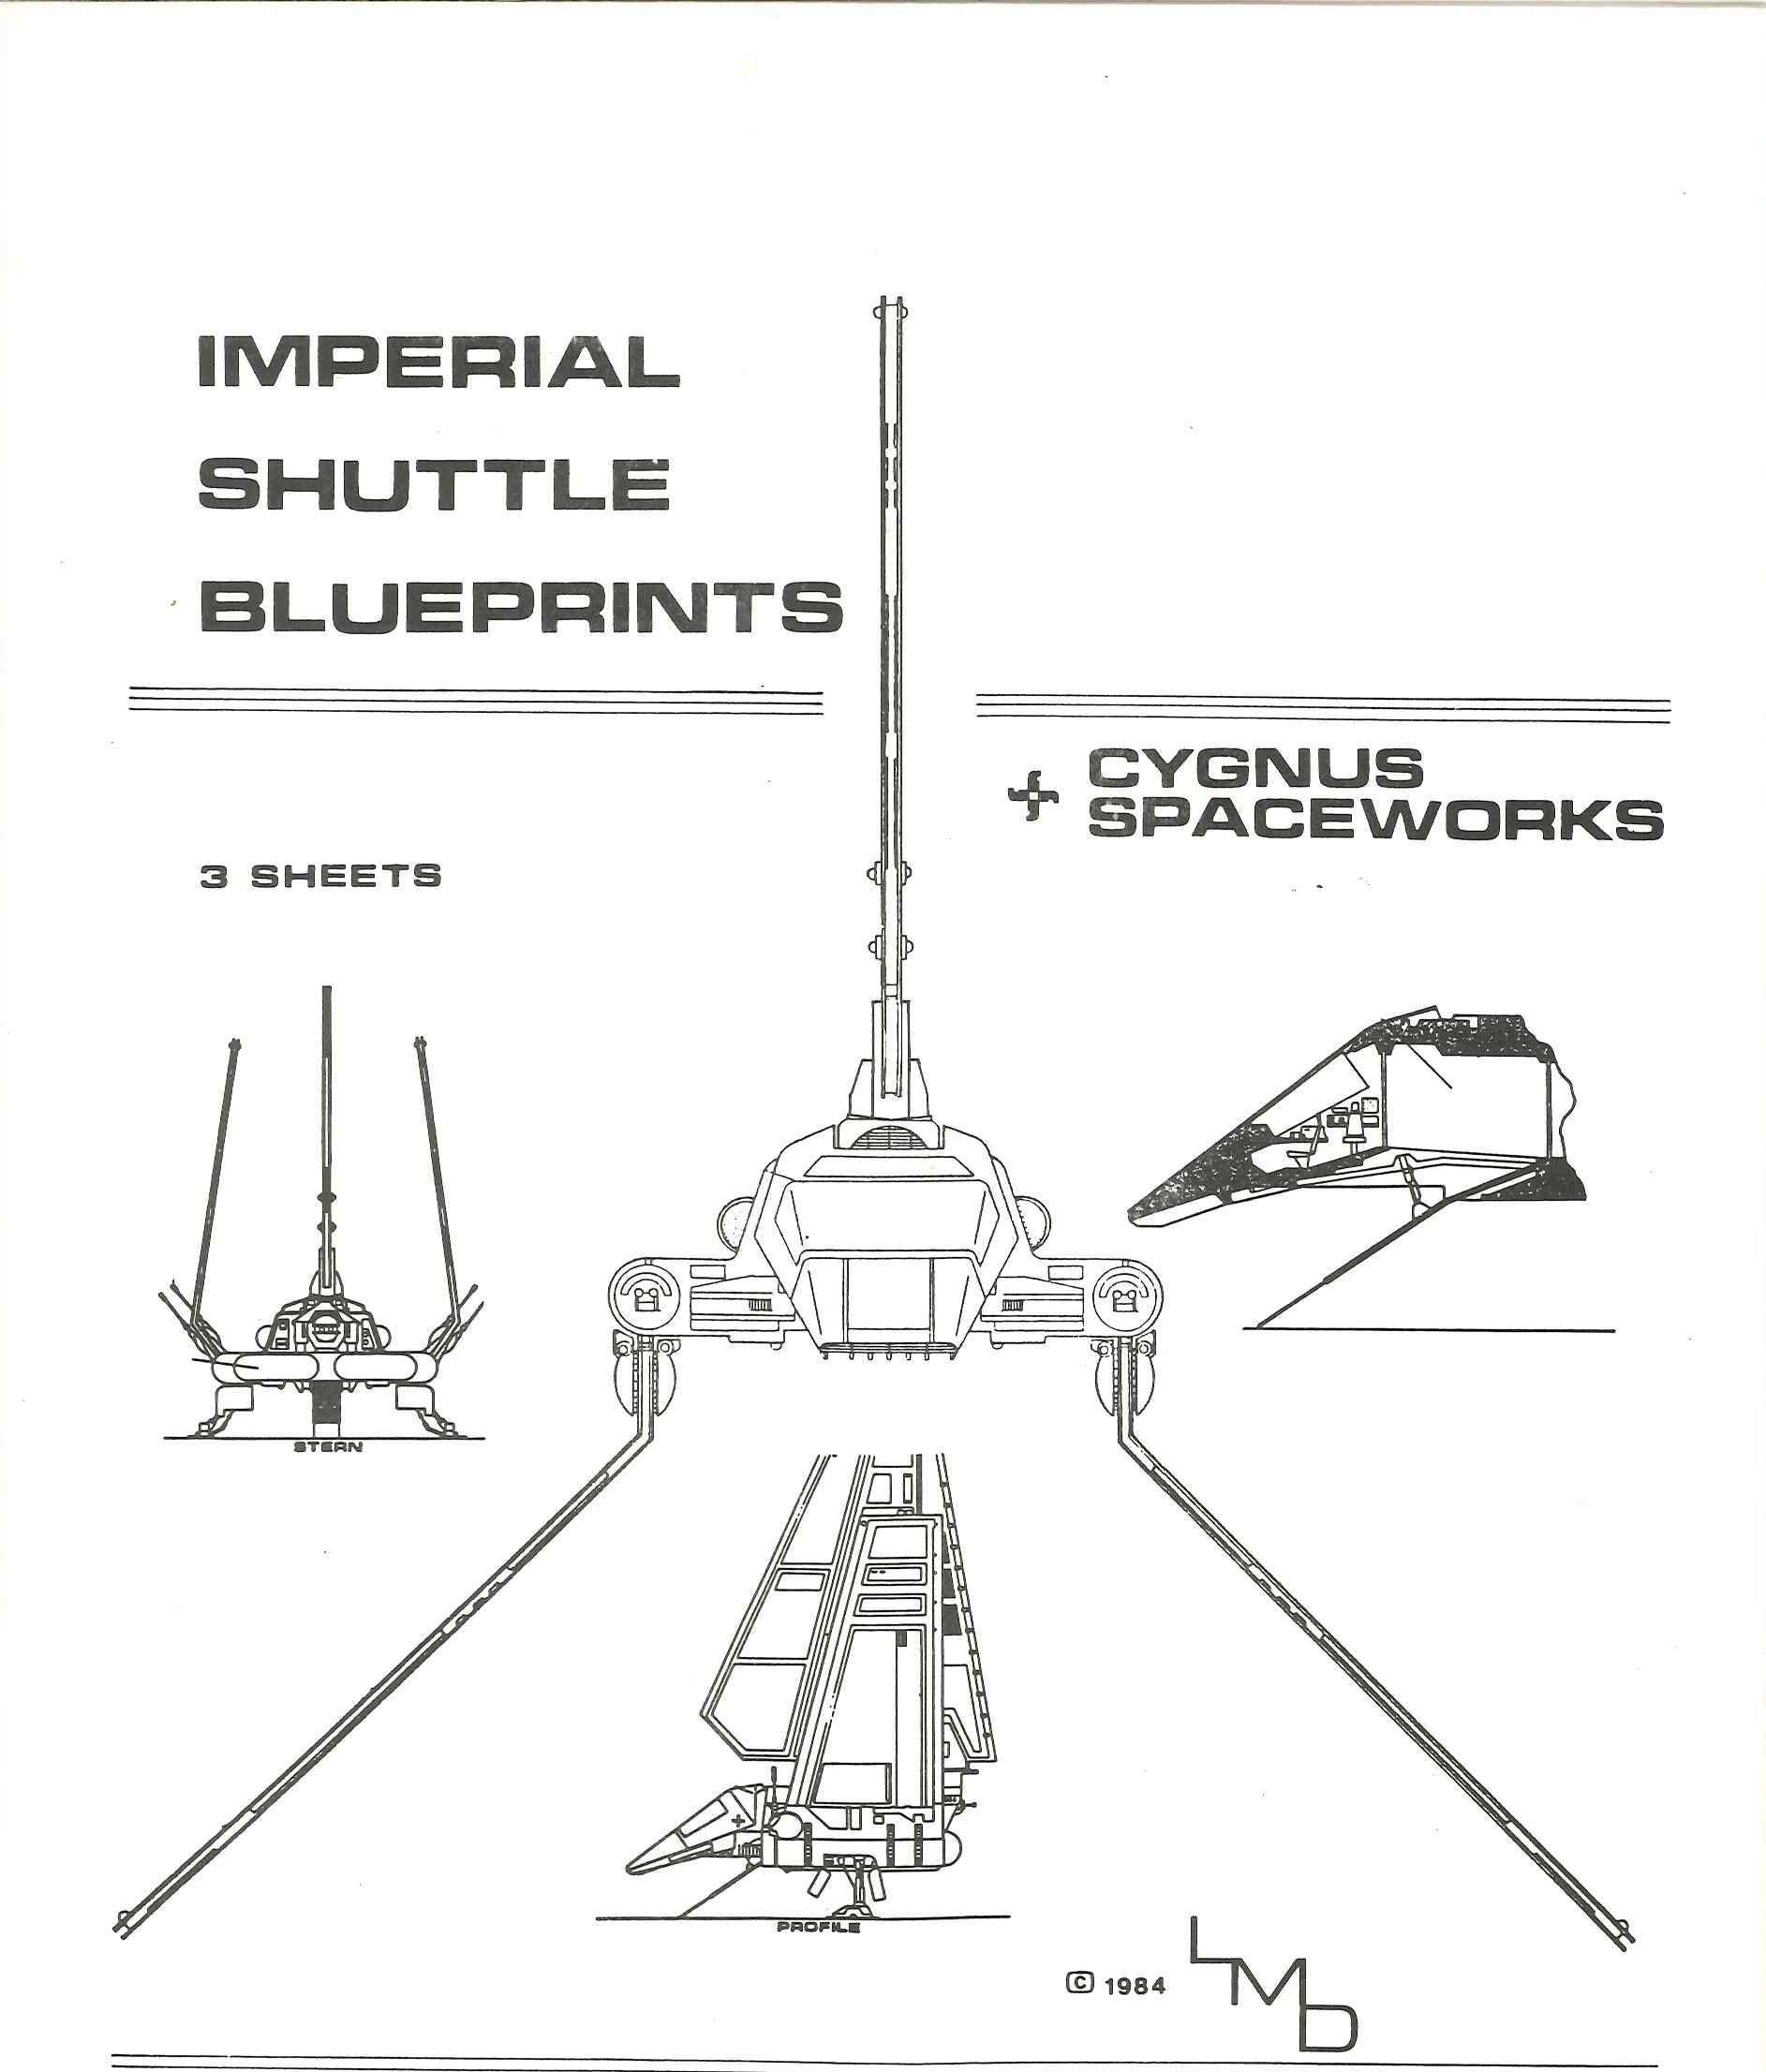 1998 expedition mach audio wiring diagram